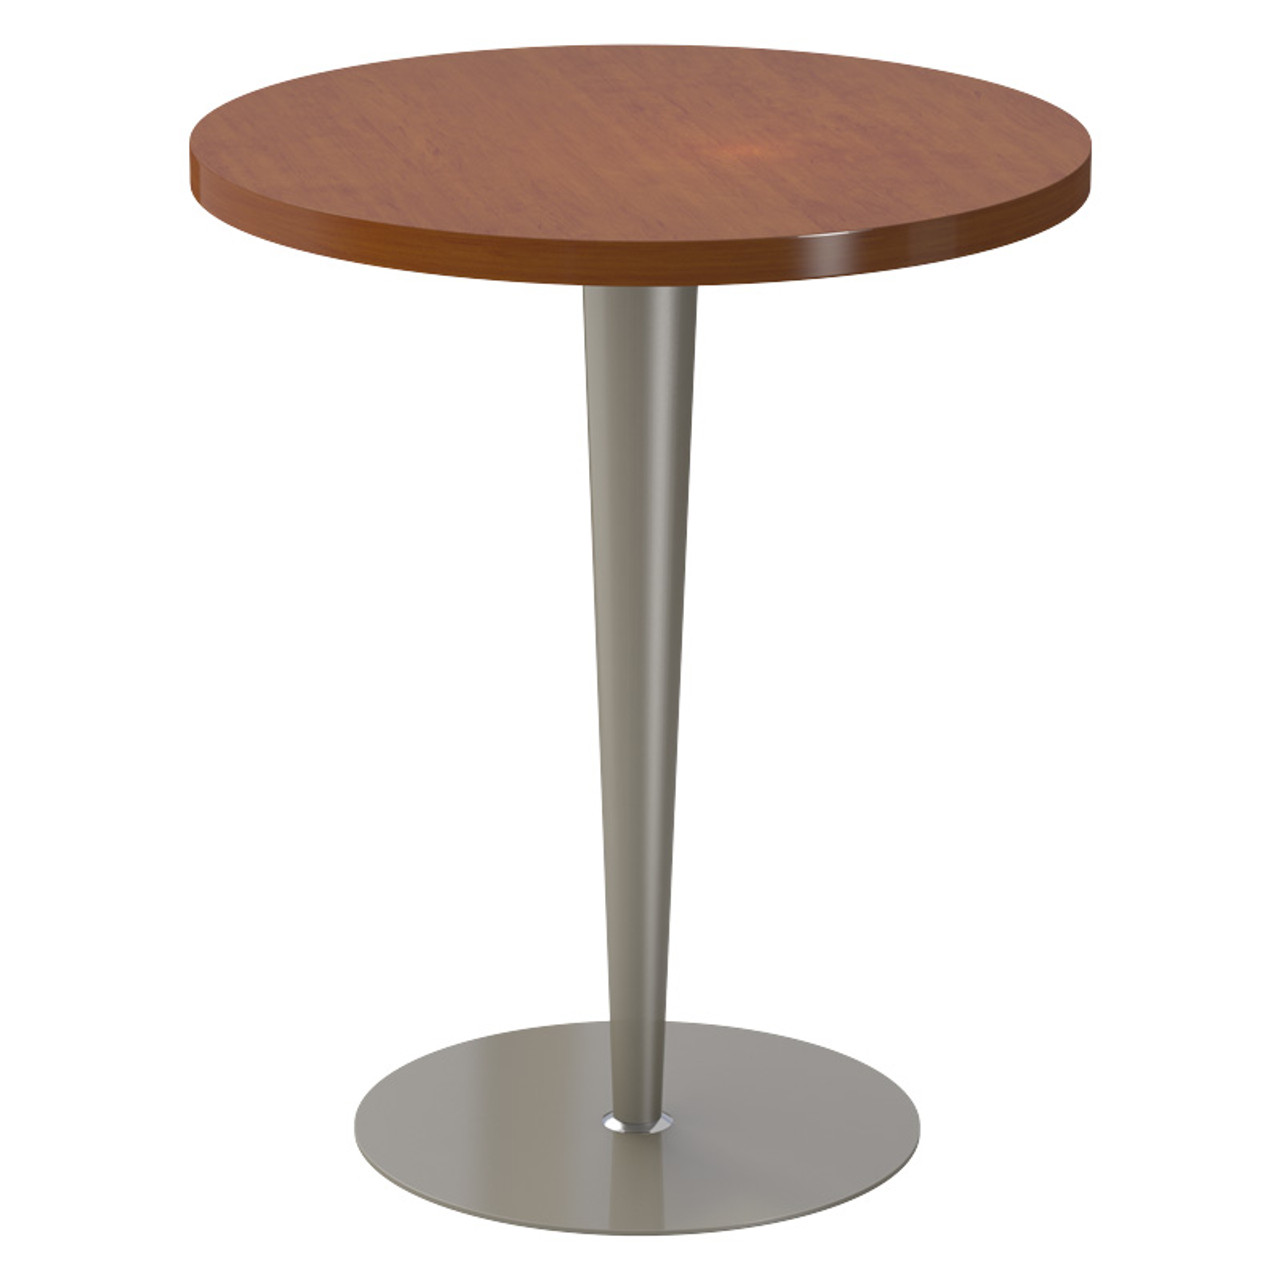 "Tapered Pedestal Base, 27-3/4"" Height, 18"" Base Diameter, 4""-2"" diameter Column, Tabletop not included - Replacementtablelegs.com"